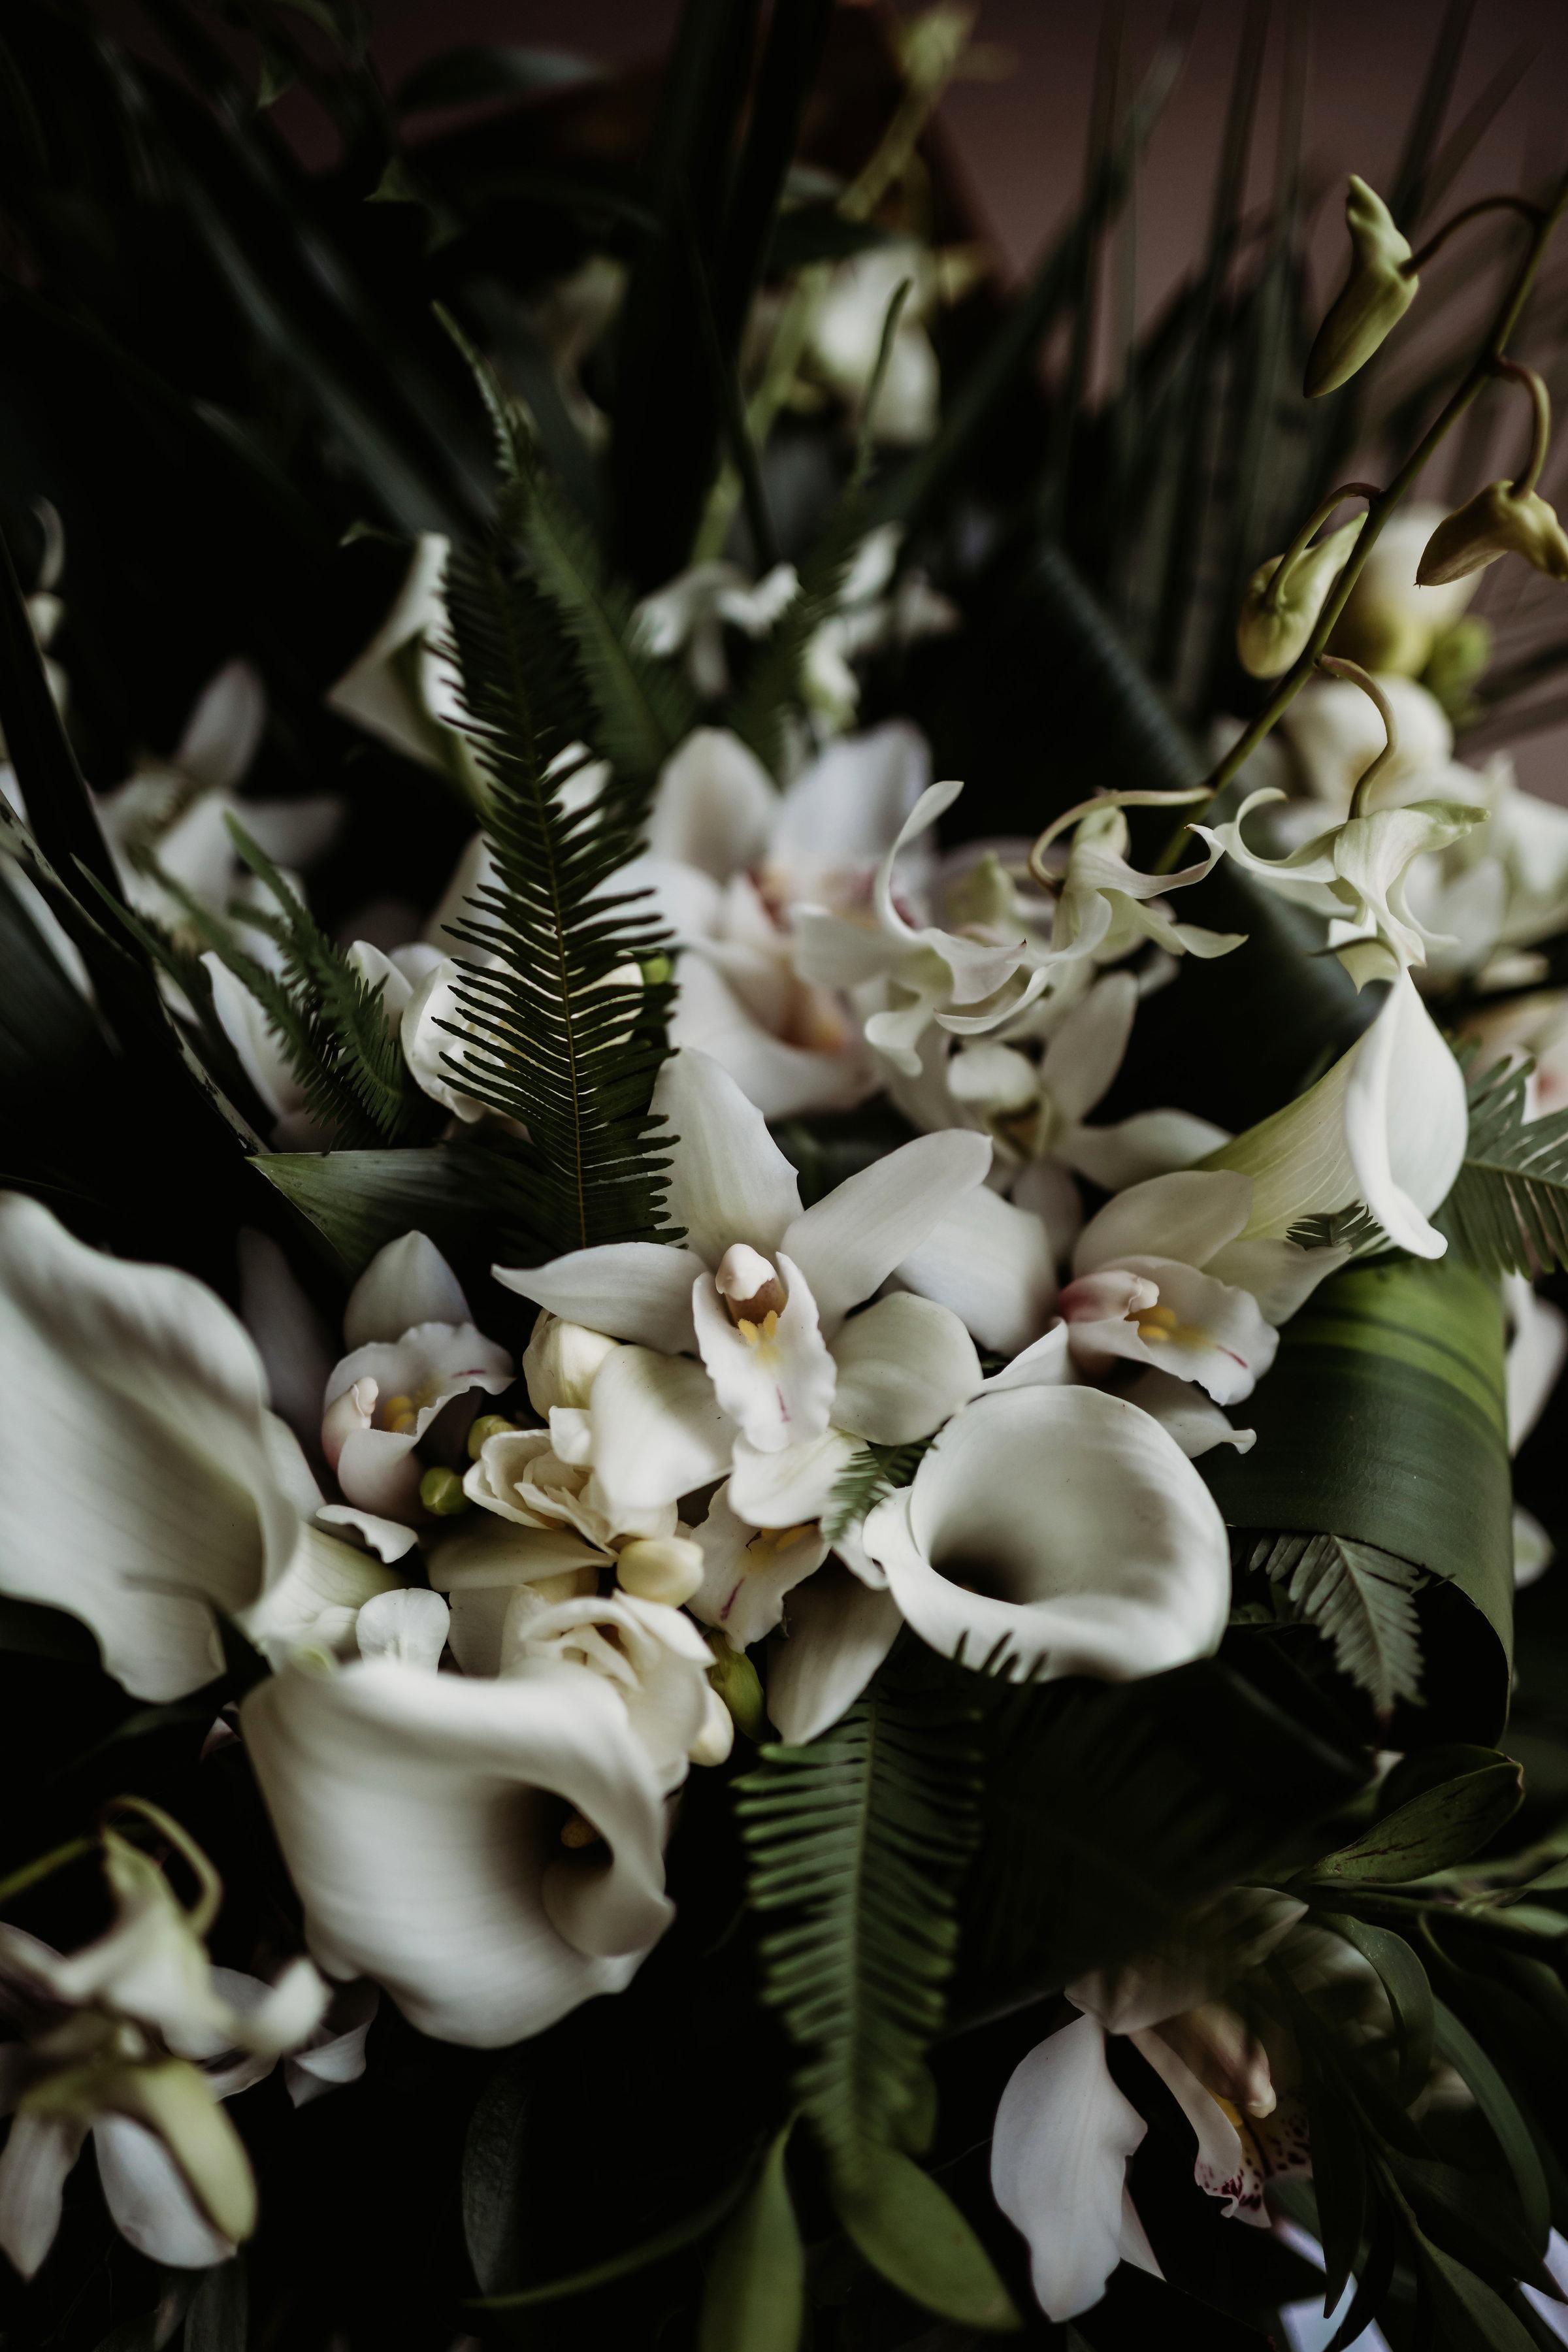 clewellphotography-49715.jpg